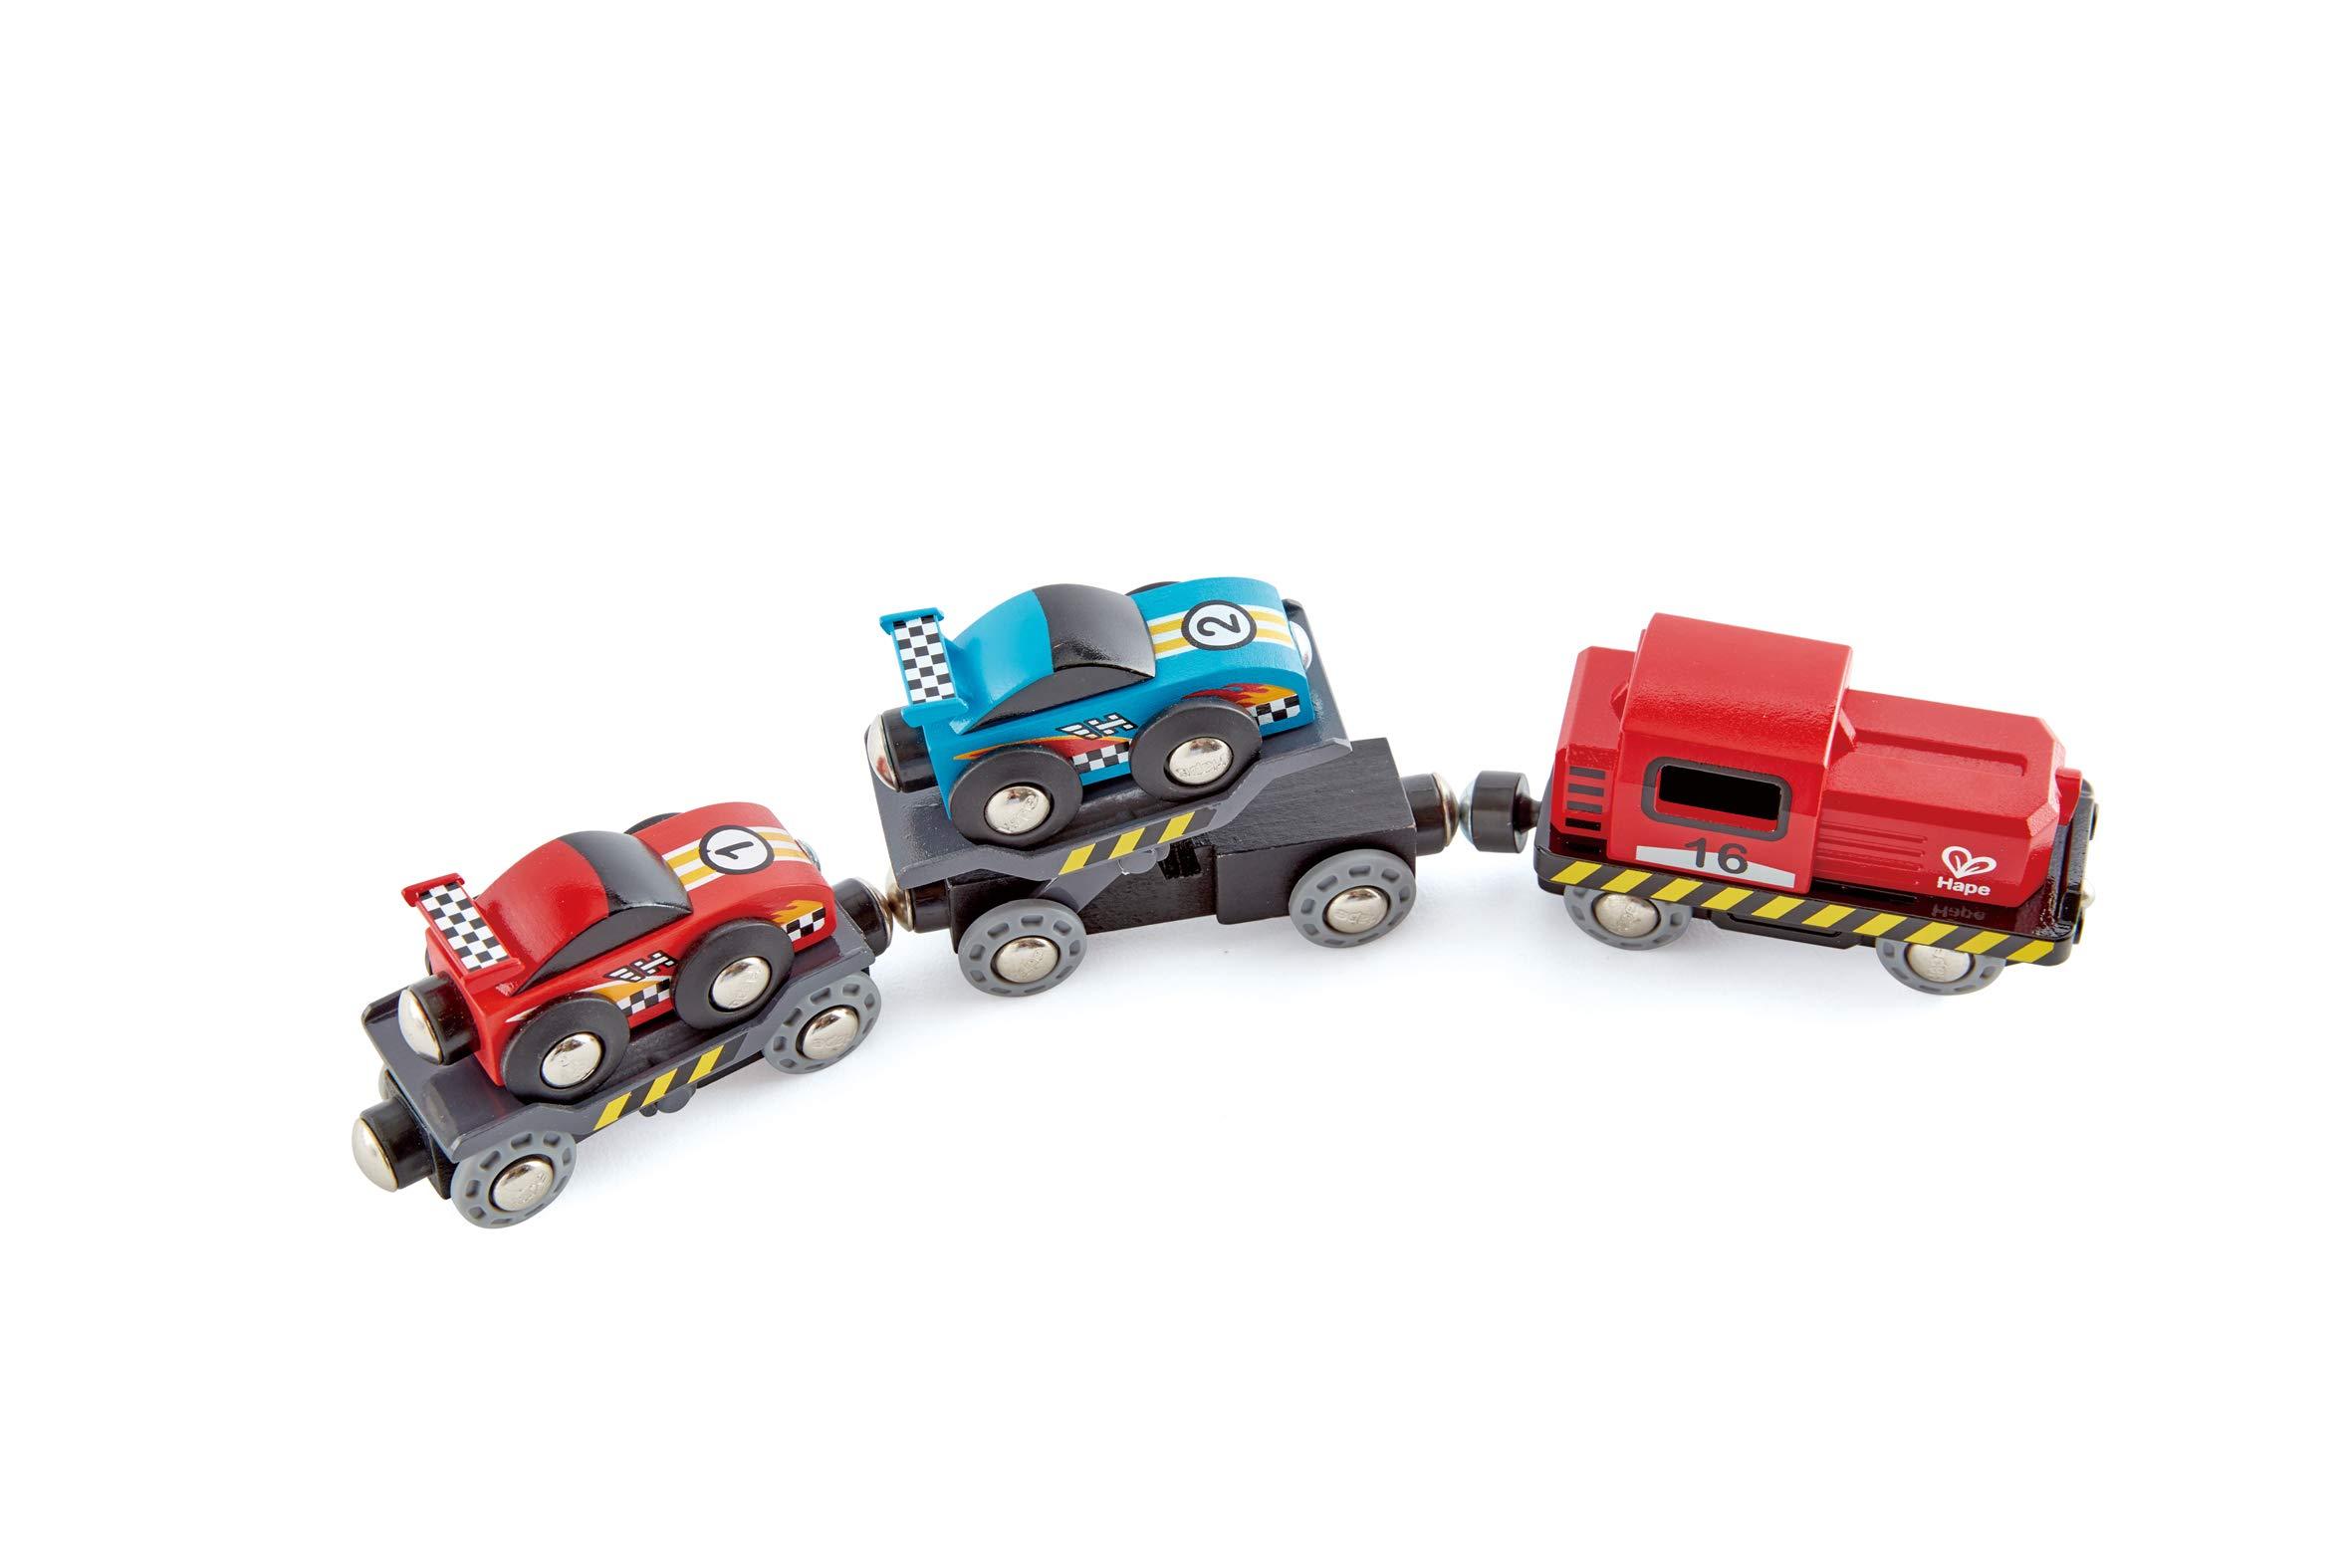 Hape Race Car Transporter | Six-Piece Wooden Toy Train Car Transport Set for Kids by Hape